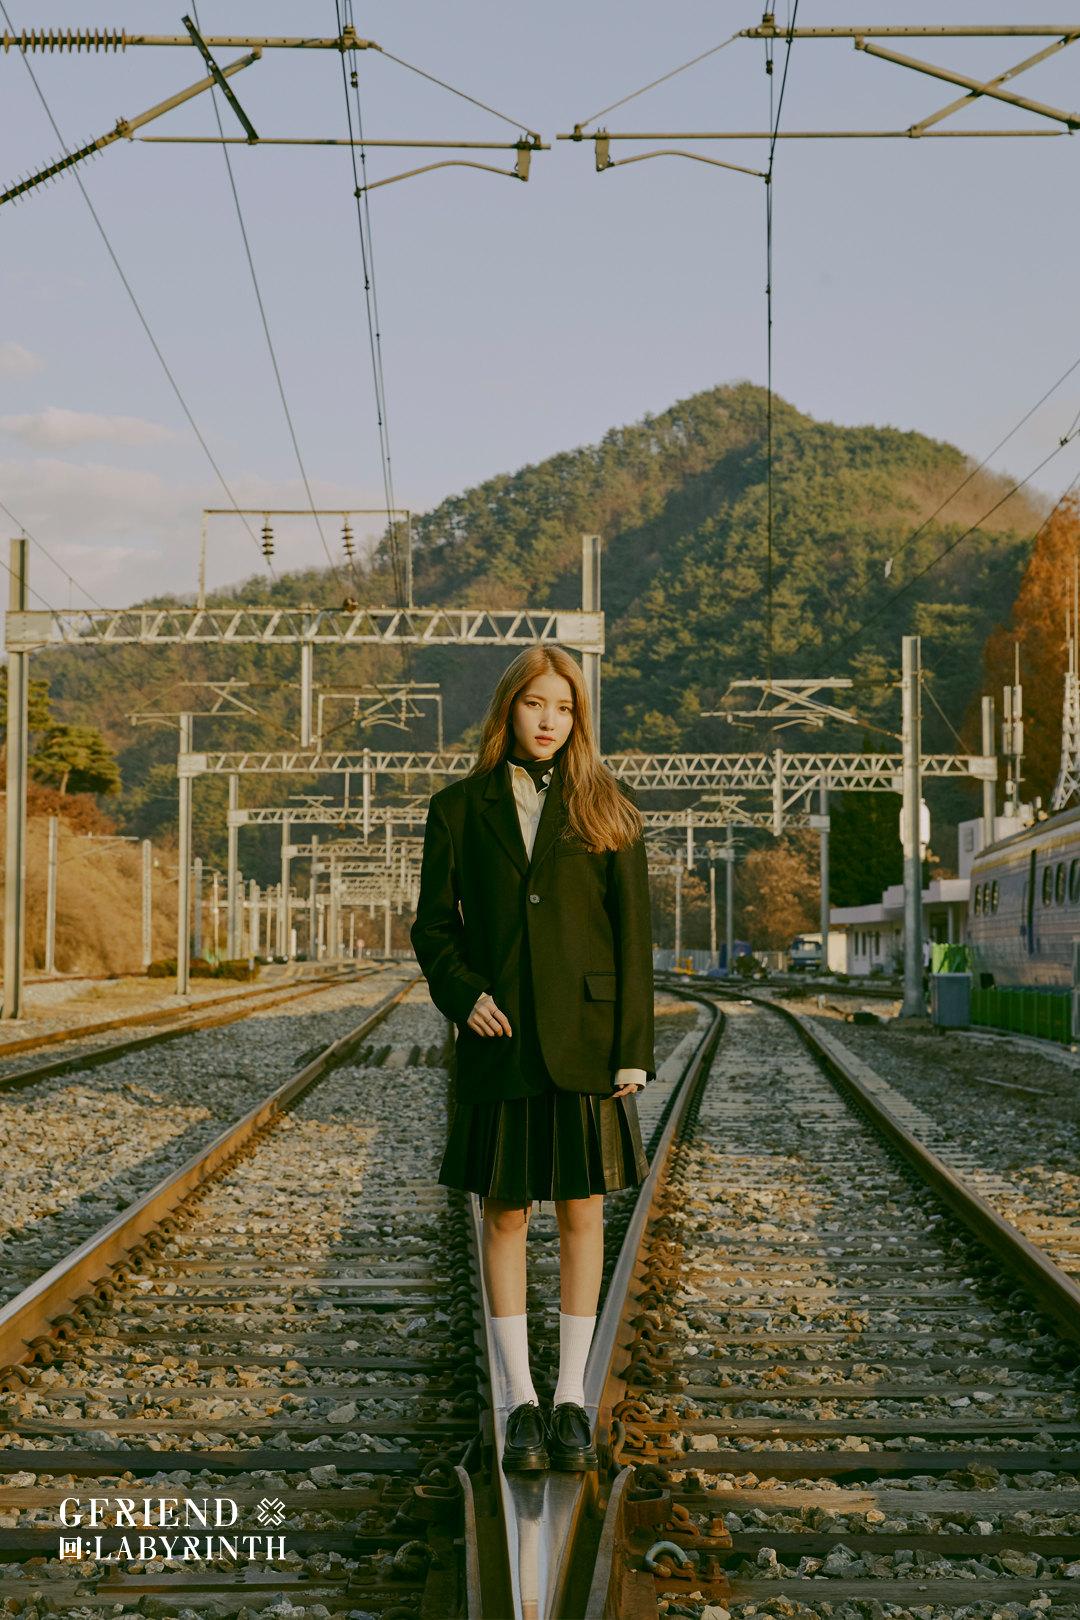 GFRIEND Sowon Labyrinth Teaser